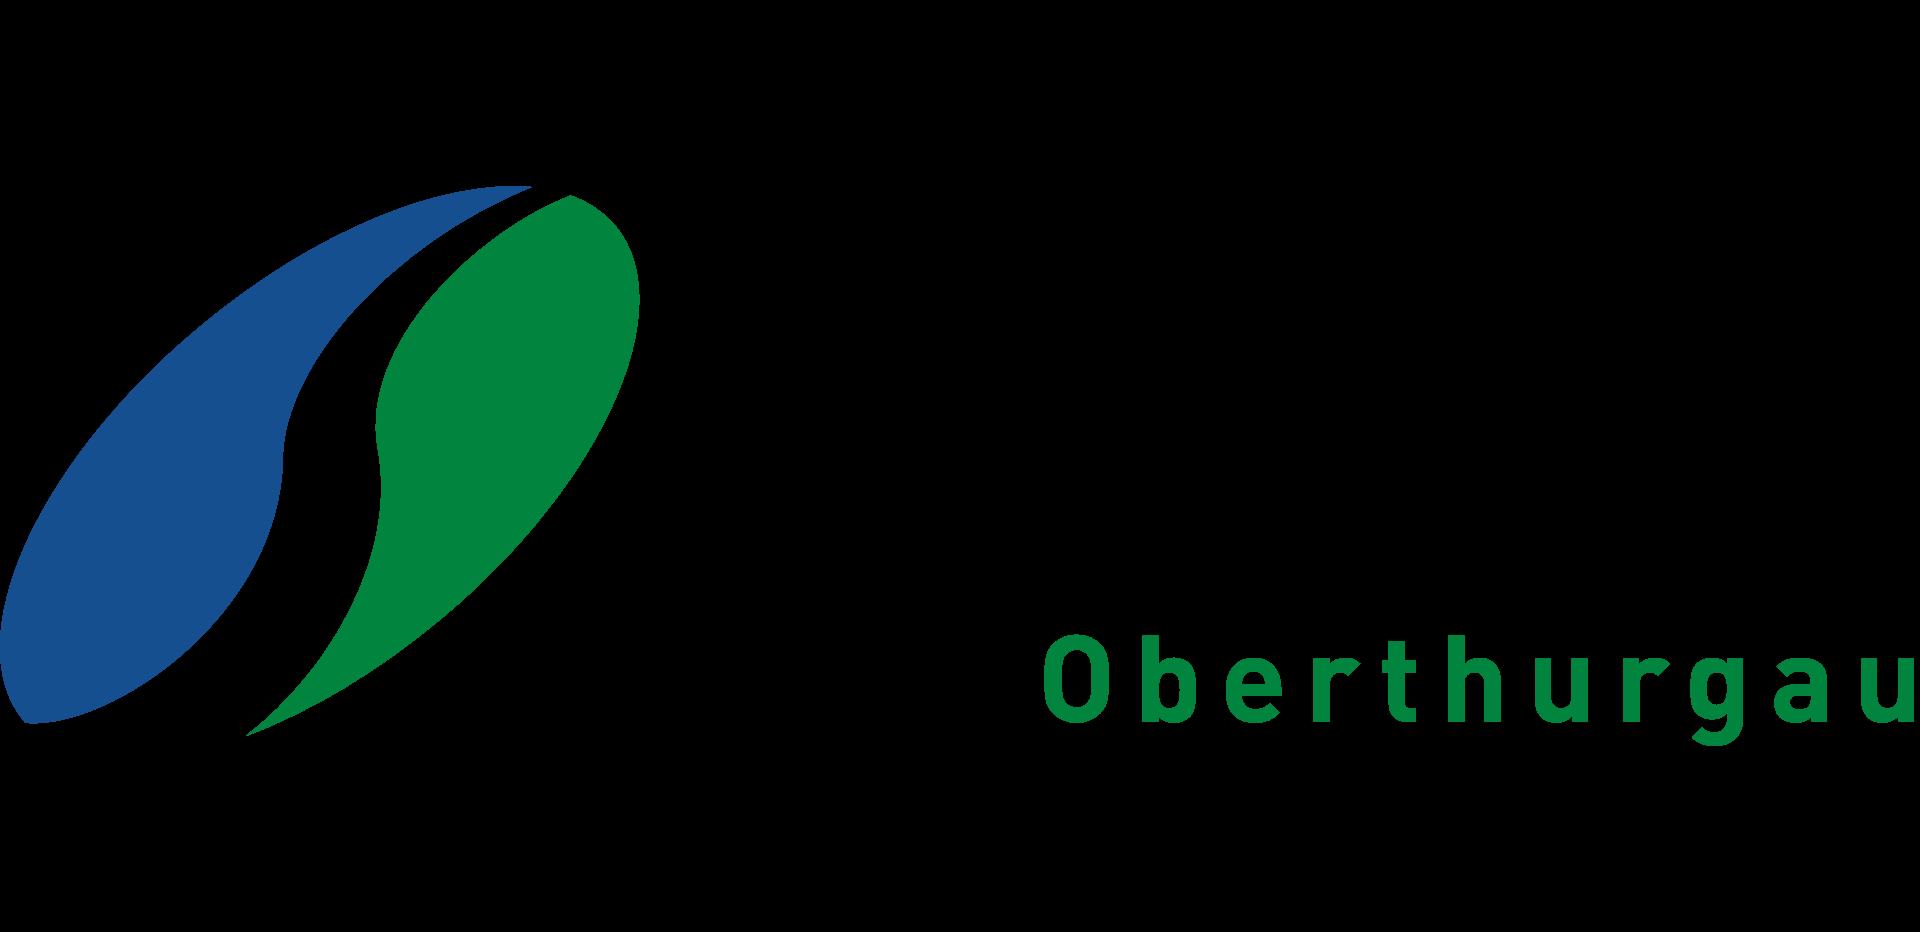 Spitex Oberthurgau